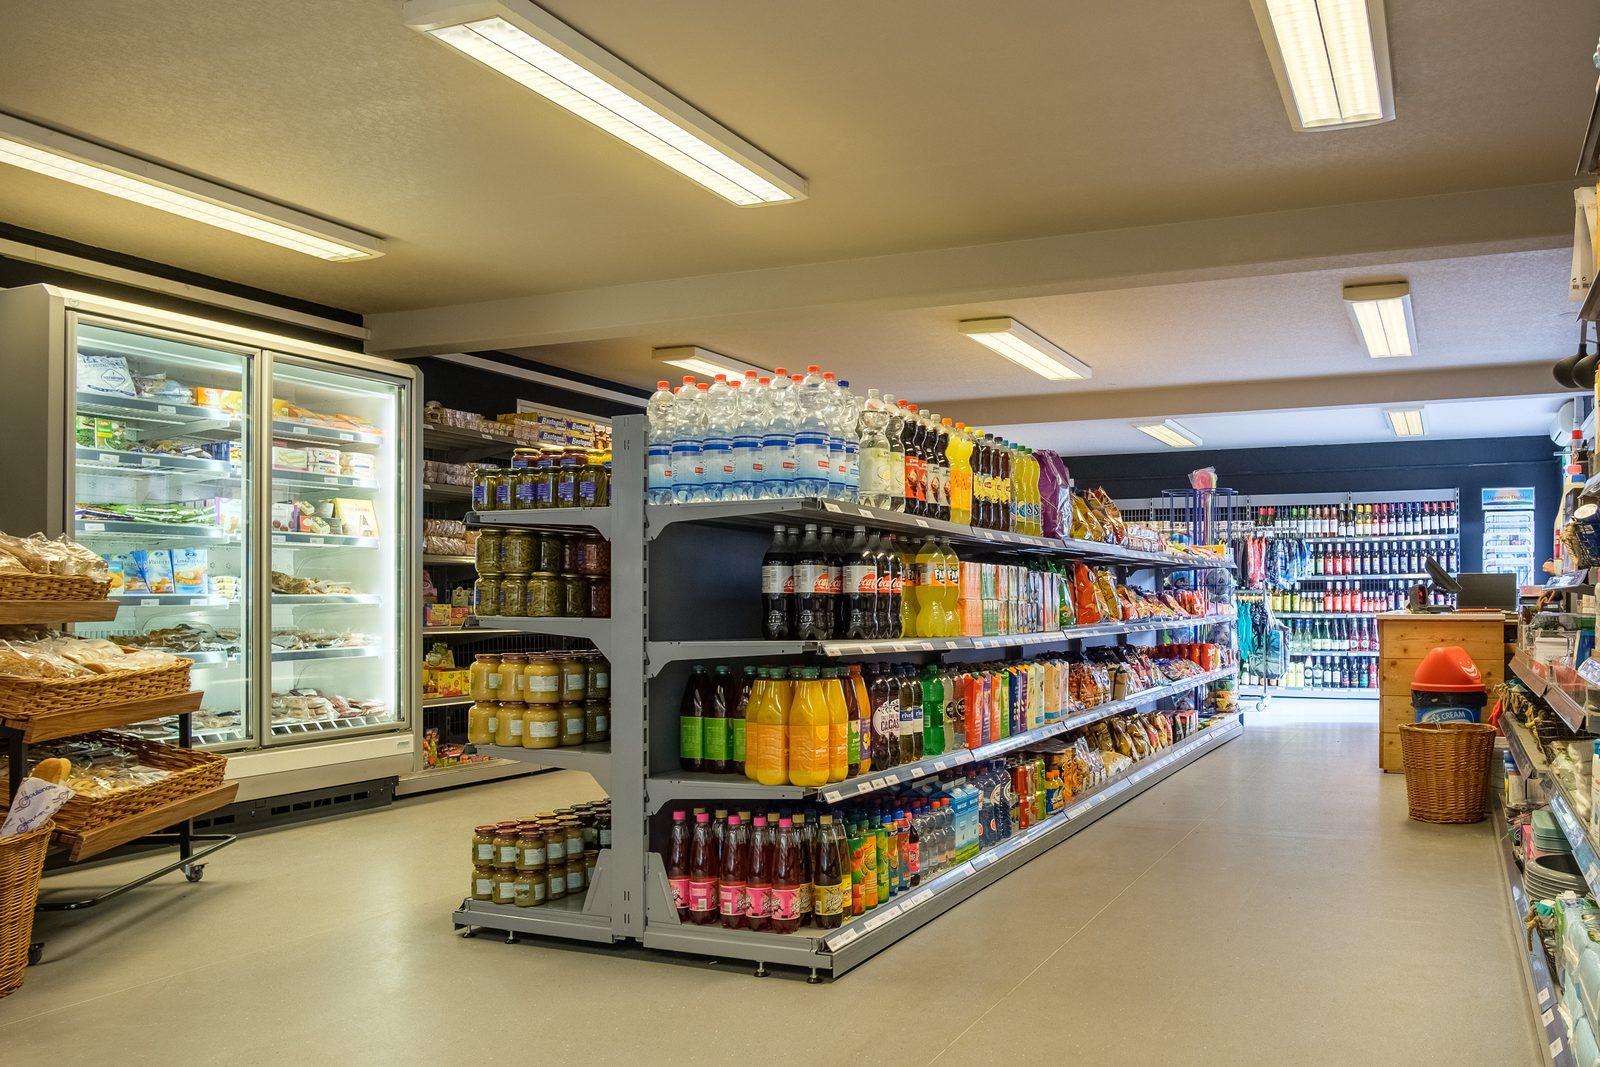 Vacature supermarktmedewerker